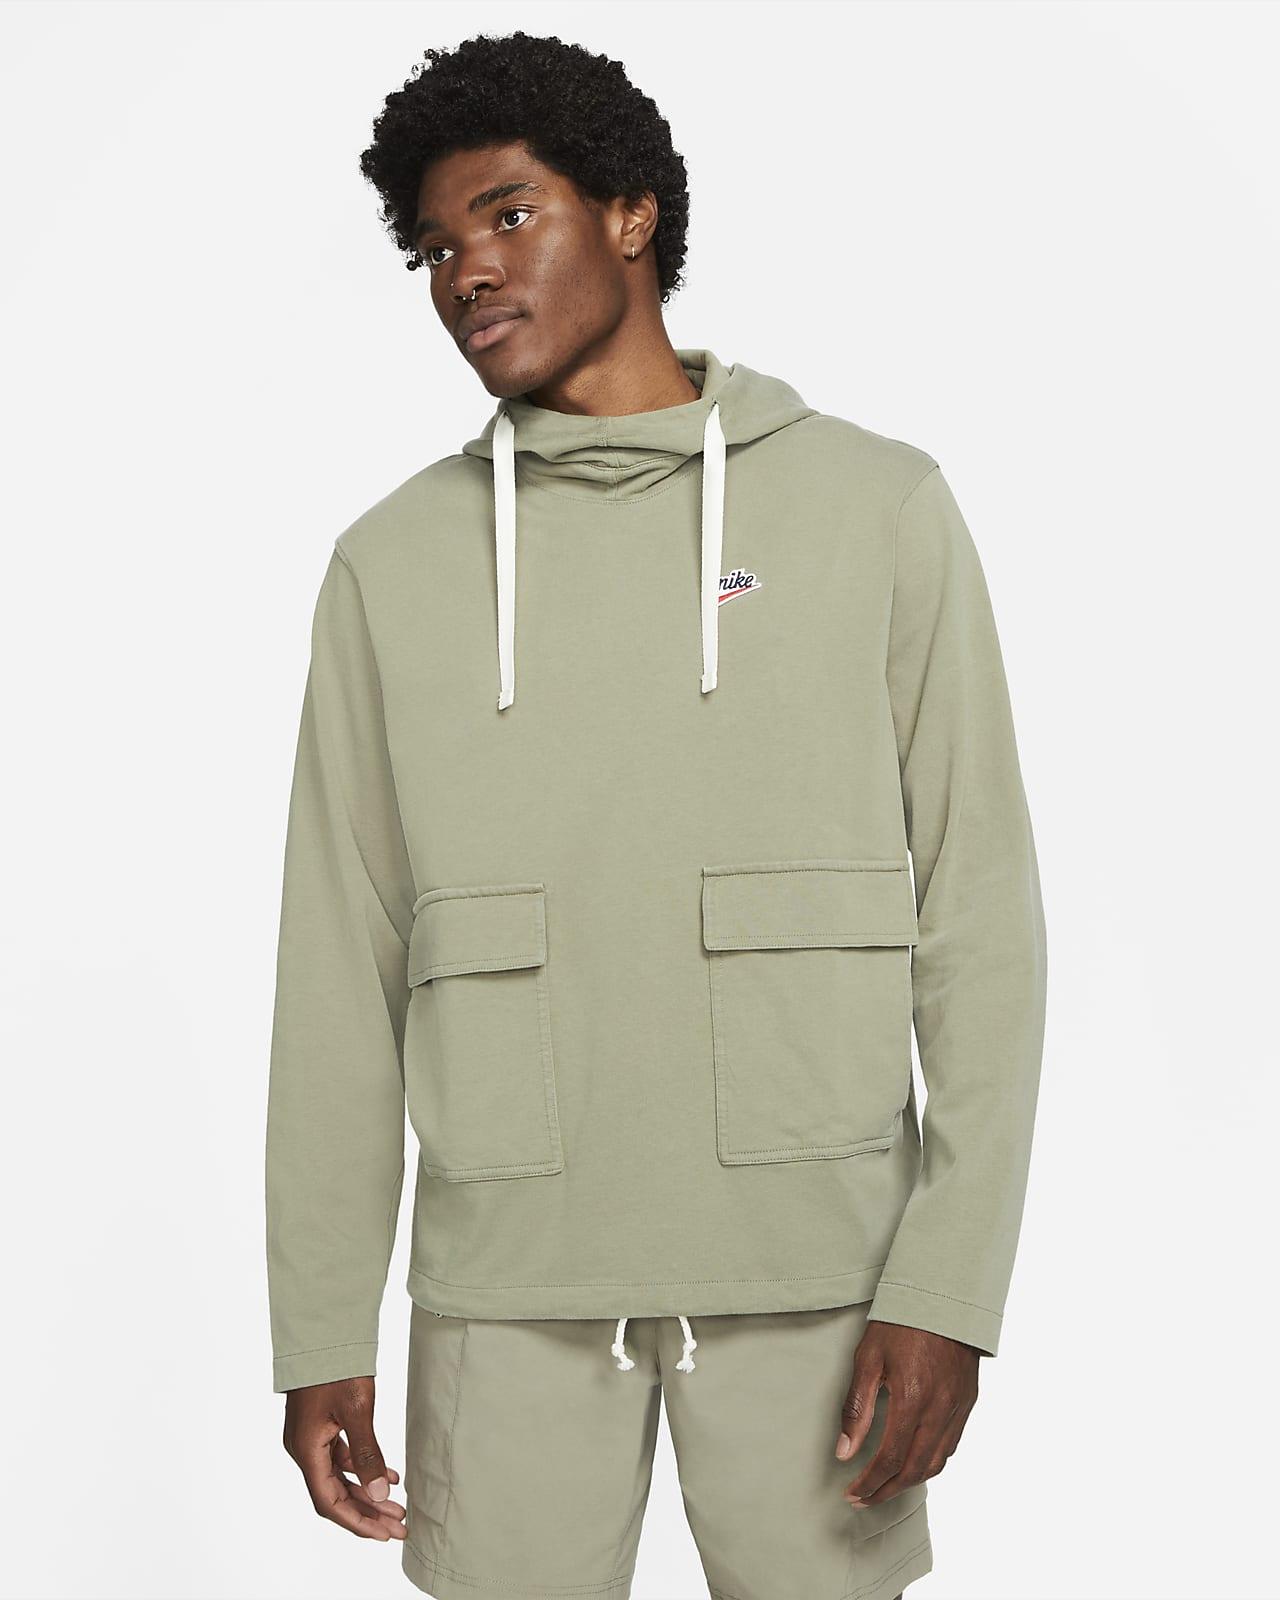 Nike Sportswear Heritage Essentials Örgü Erkek Kapüşonlu Sweatshirt'ü